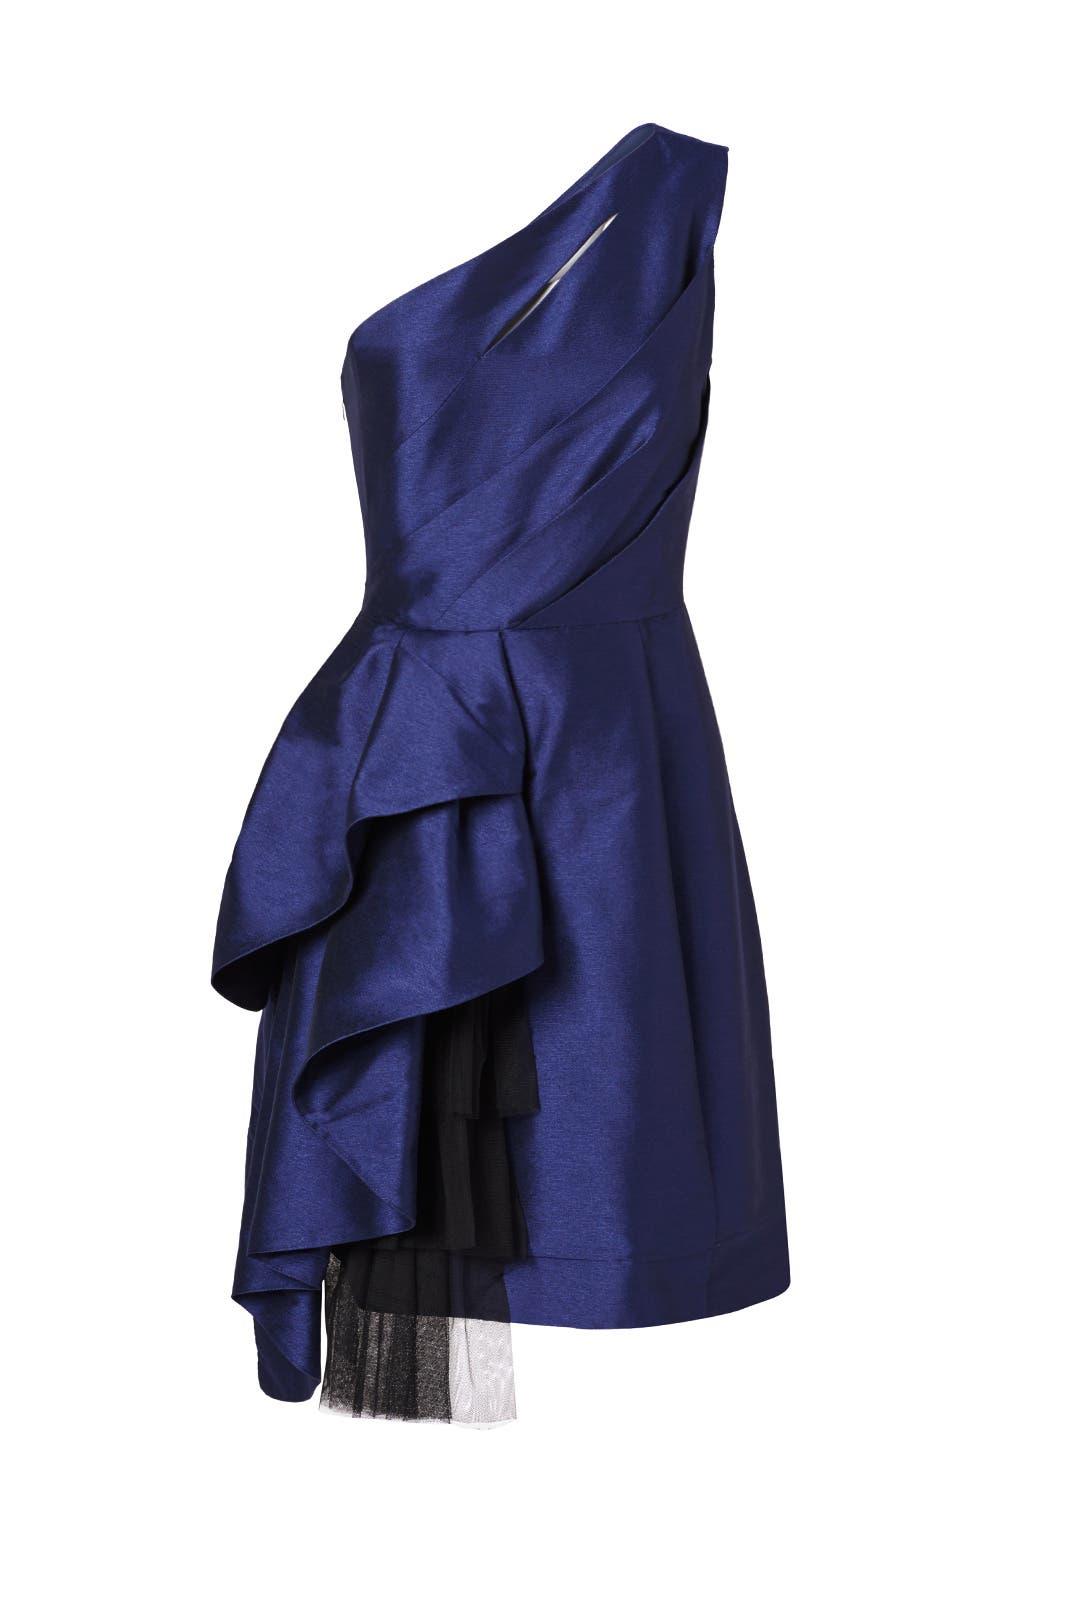 Plus Size Dresses Rental 21